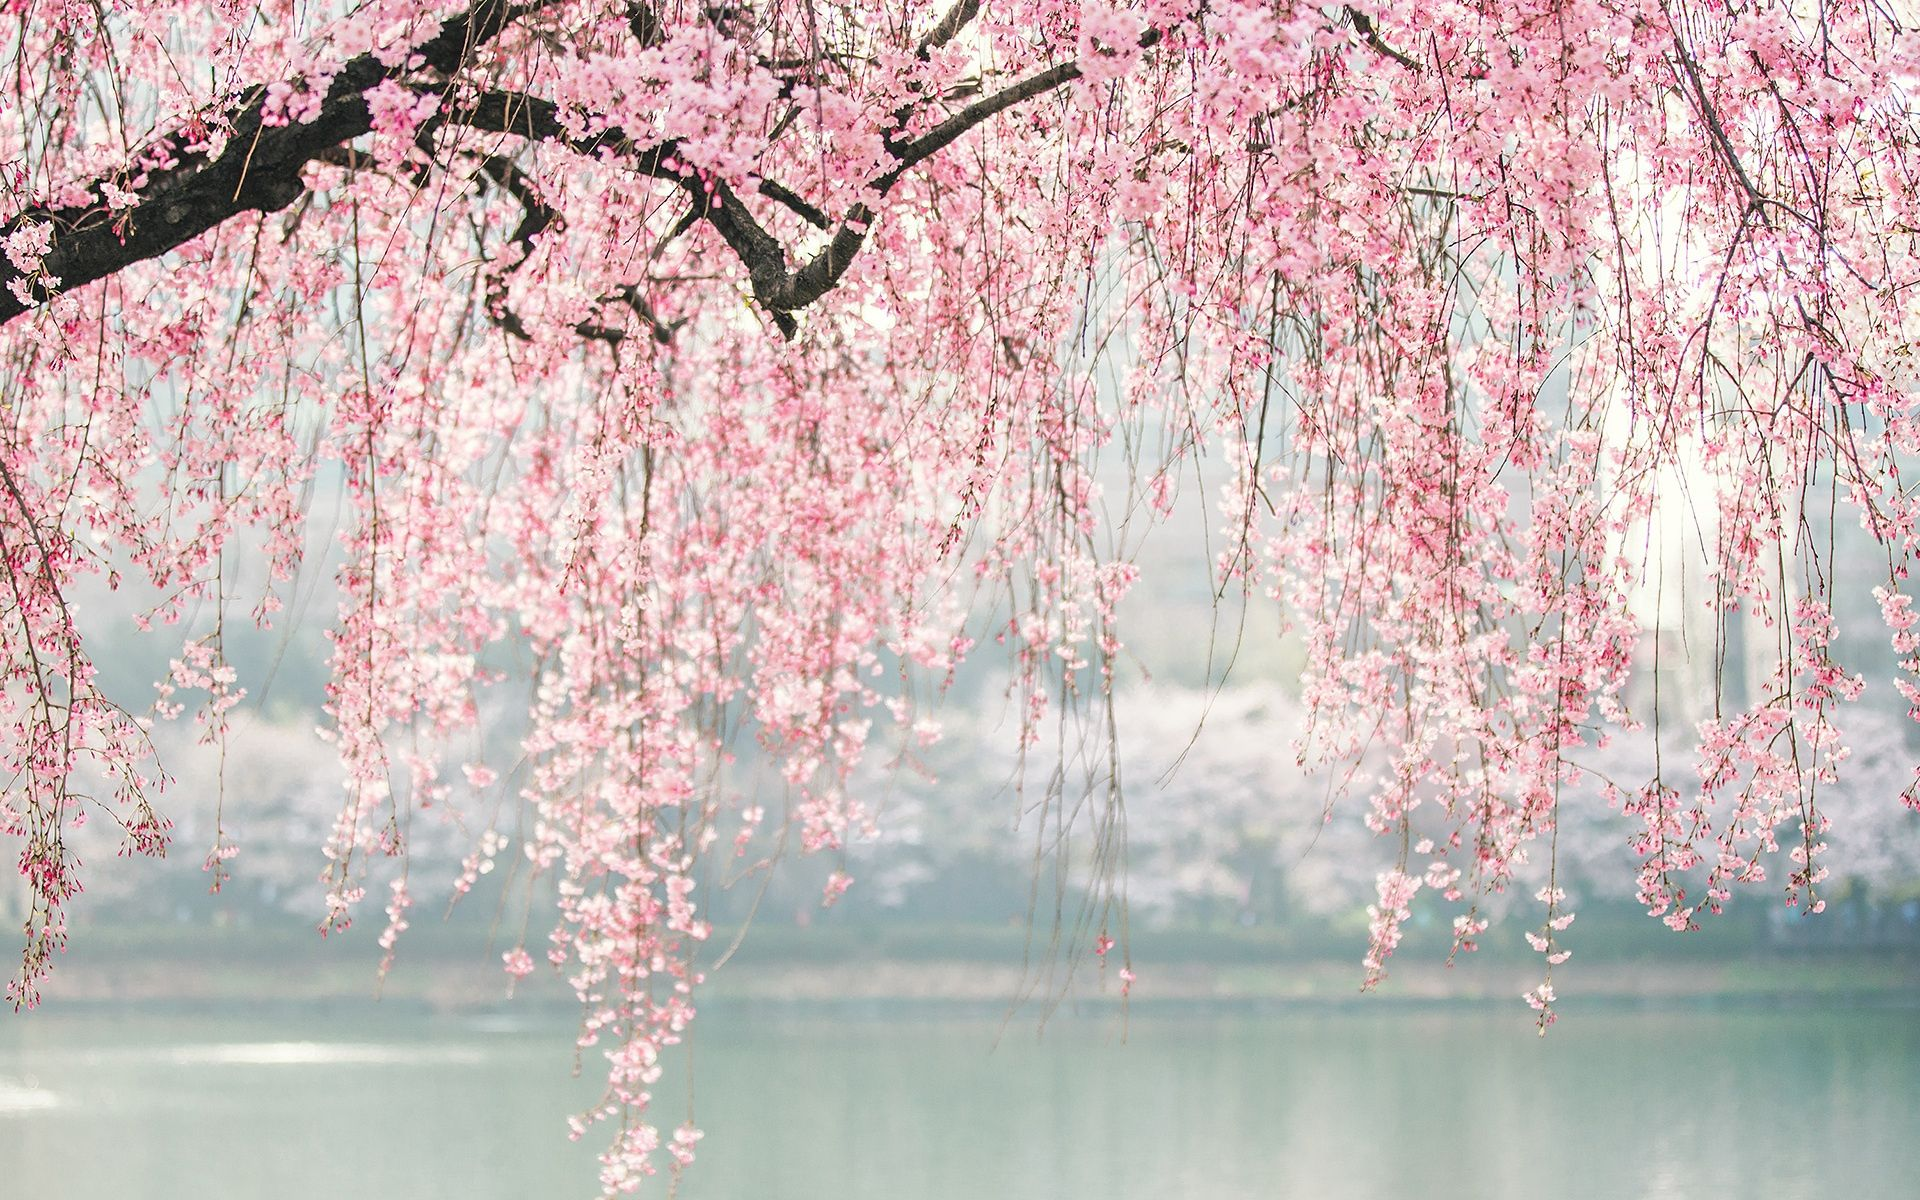 Cherry Blossom Anime Scenery Wallpaper Free Download 90289 Wallpaper Aesthetic Desktop Wallpaper Anime Backgrounds Wallpapers Anime Scenery Wallpaper